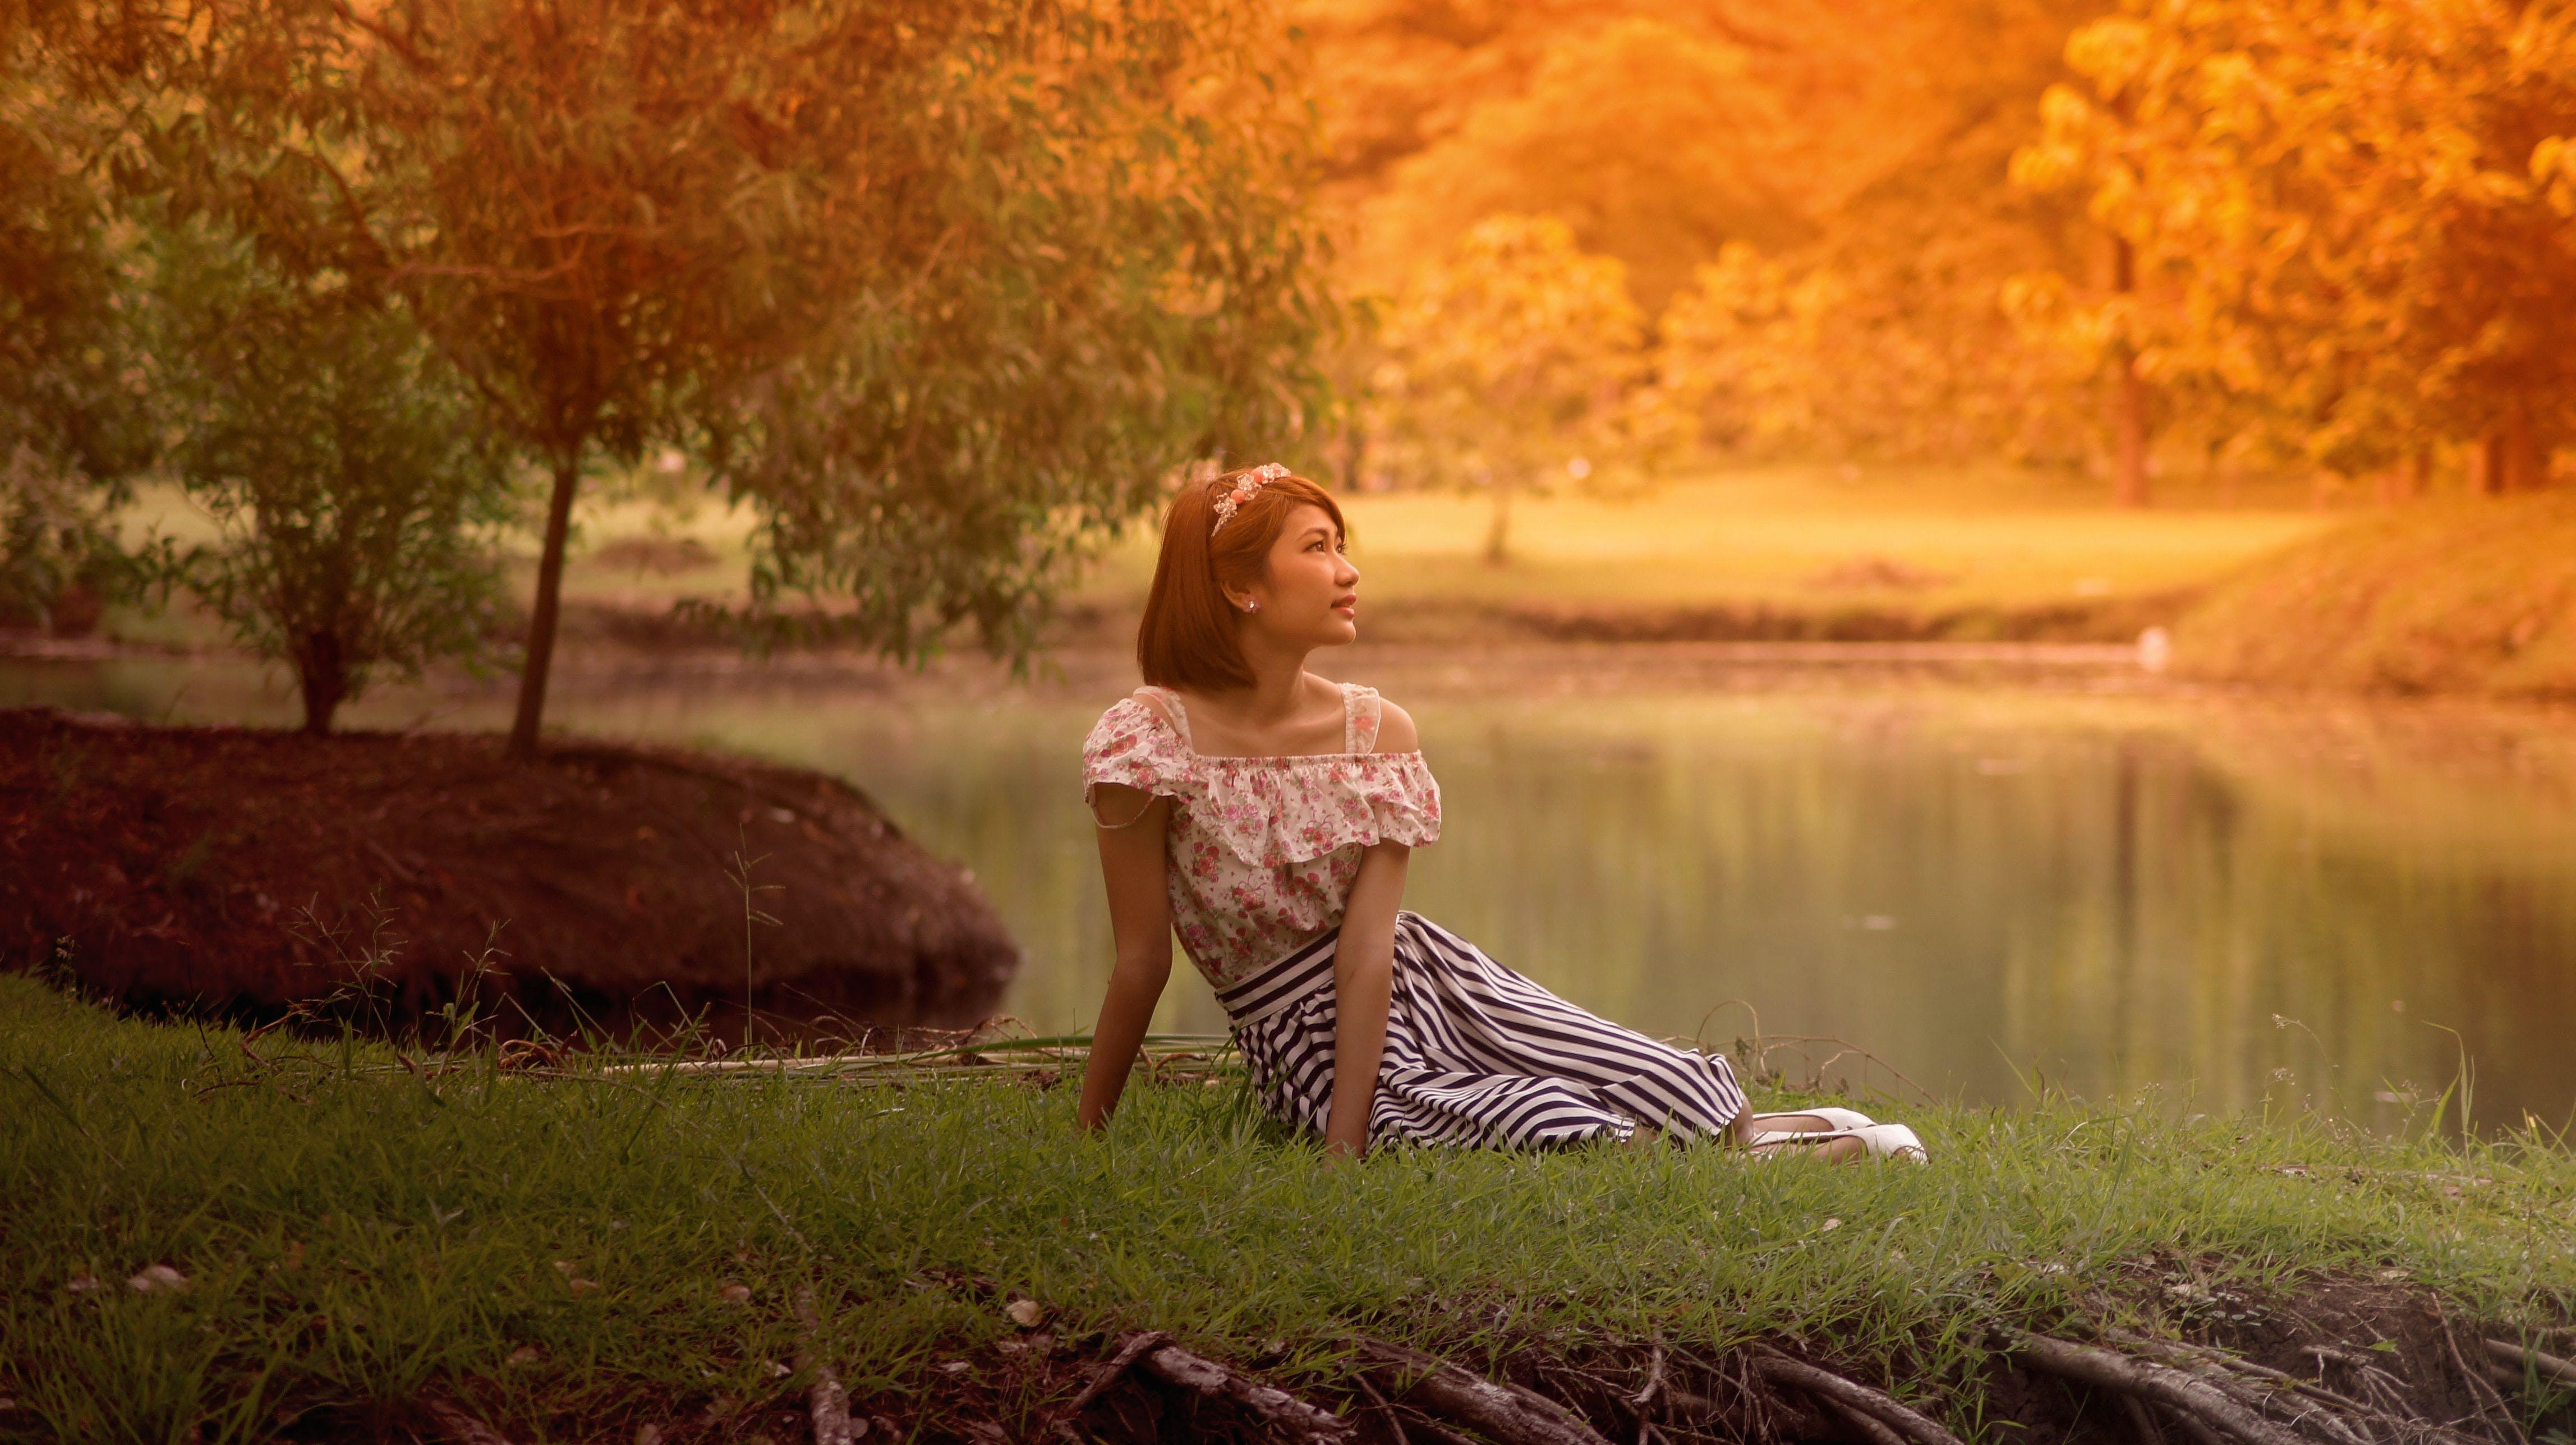 Woman in Dress Lying on Grass